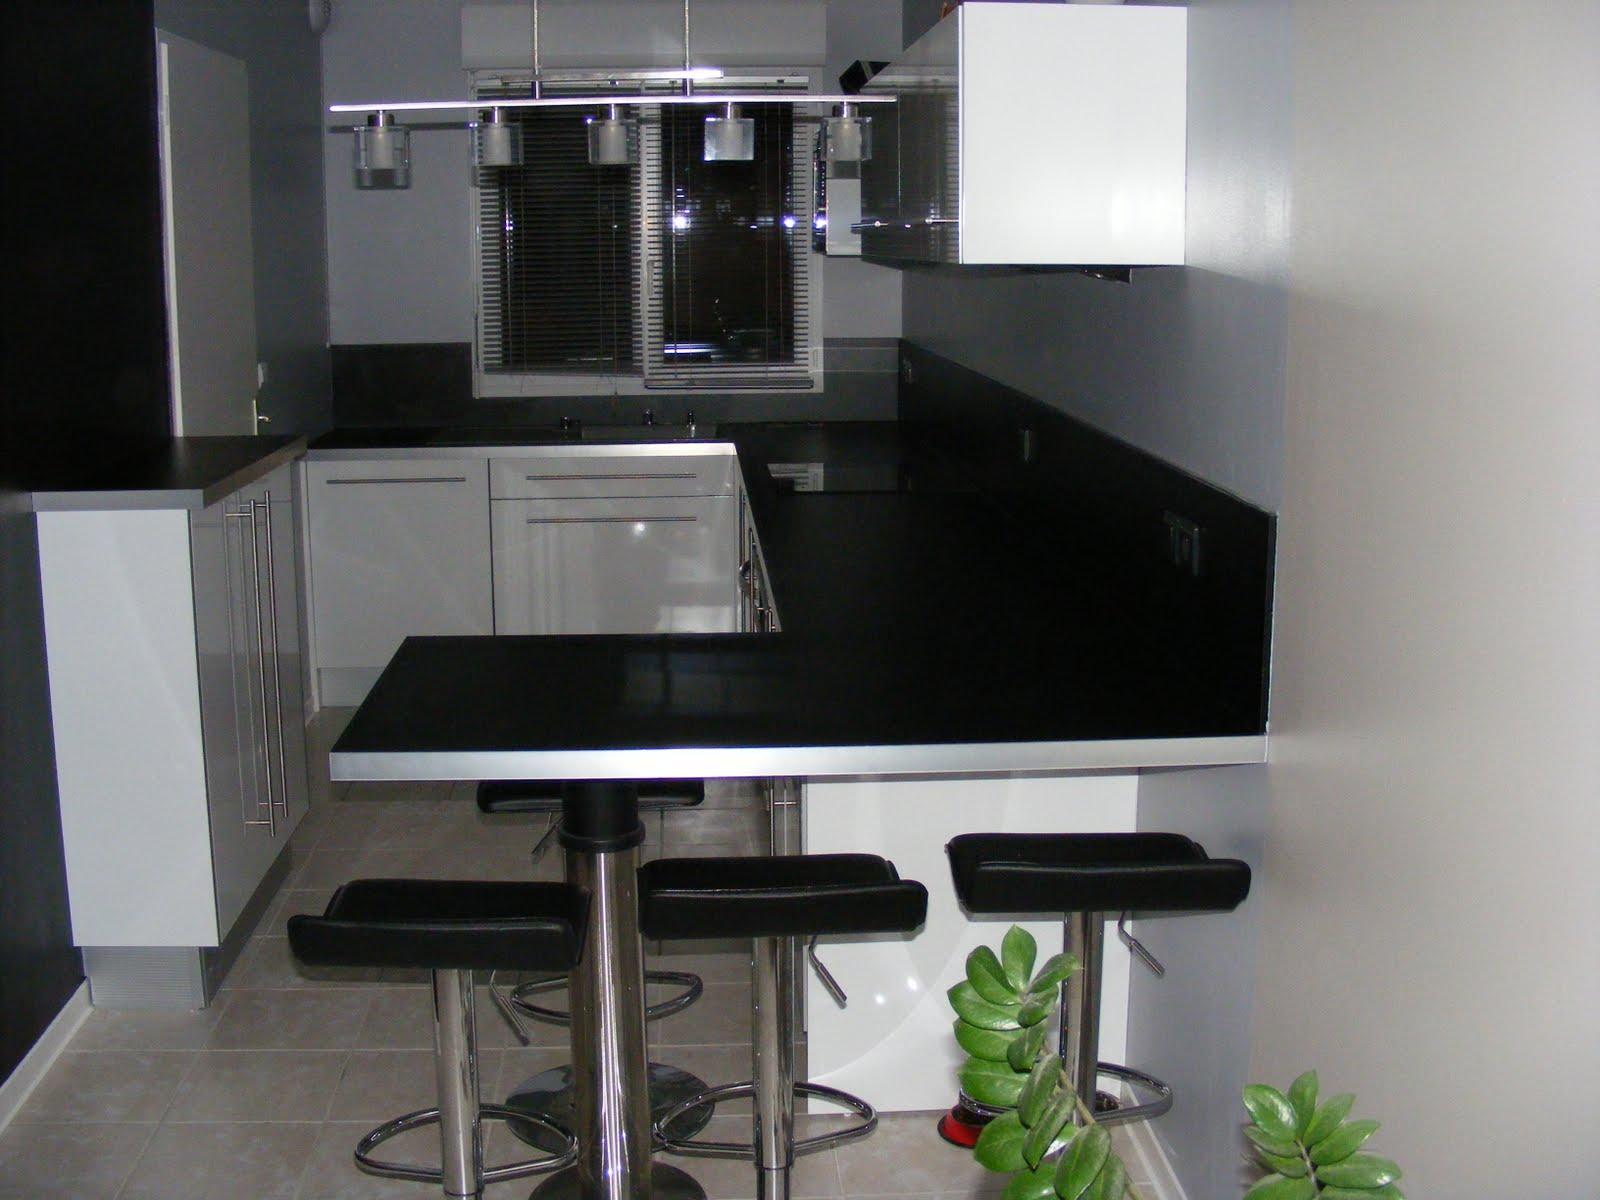 pin modele de cuisine americaine pelautscom on pinterest. Black Bedroom Furniture Sets. Home Design Ideas